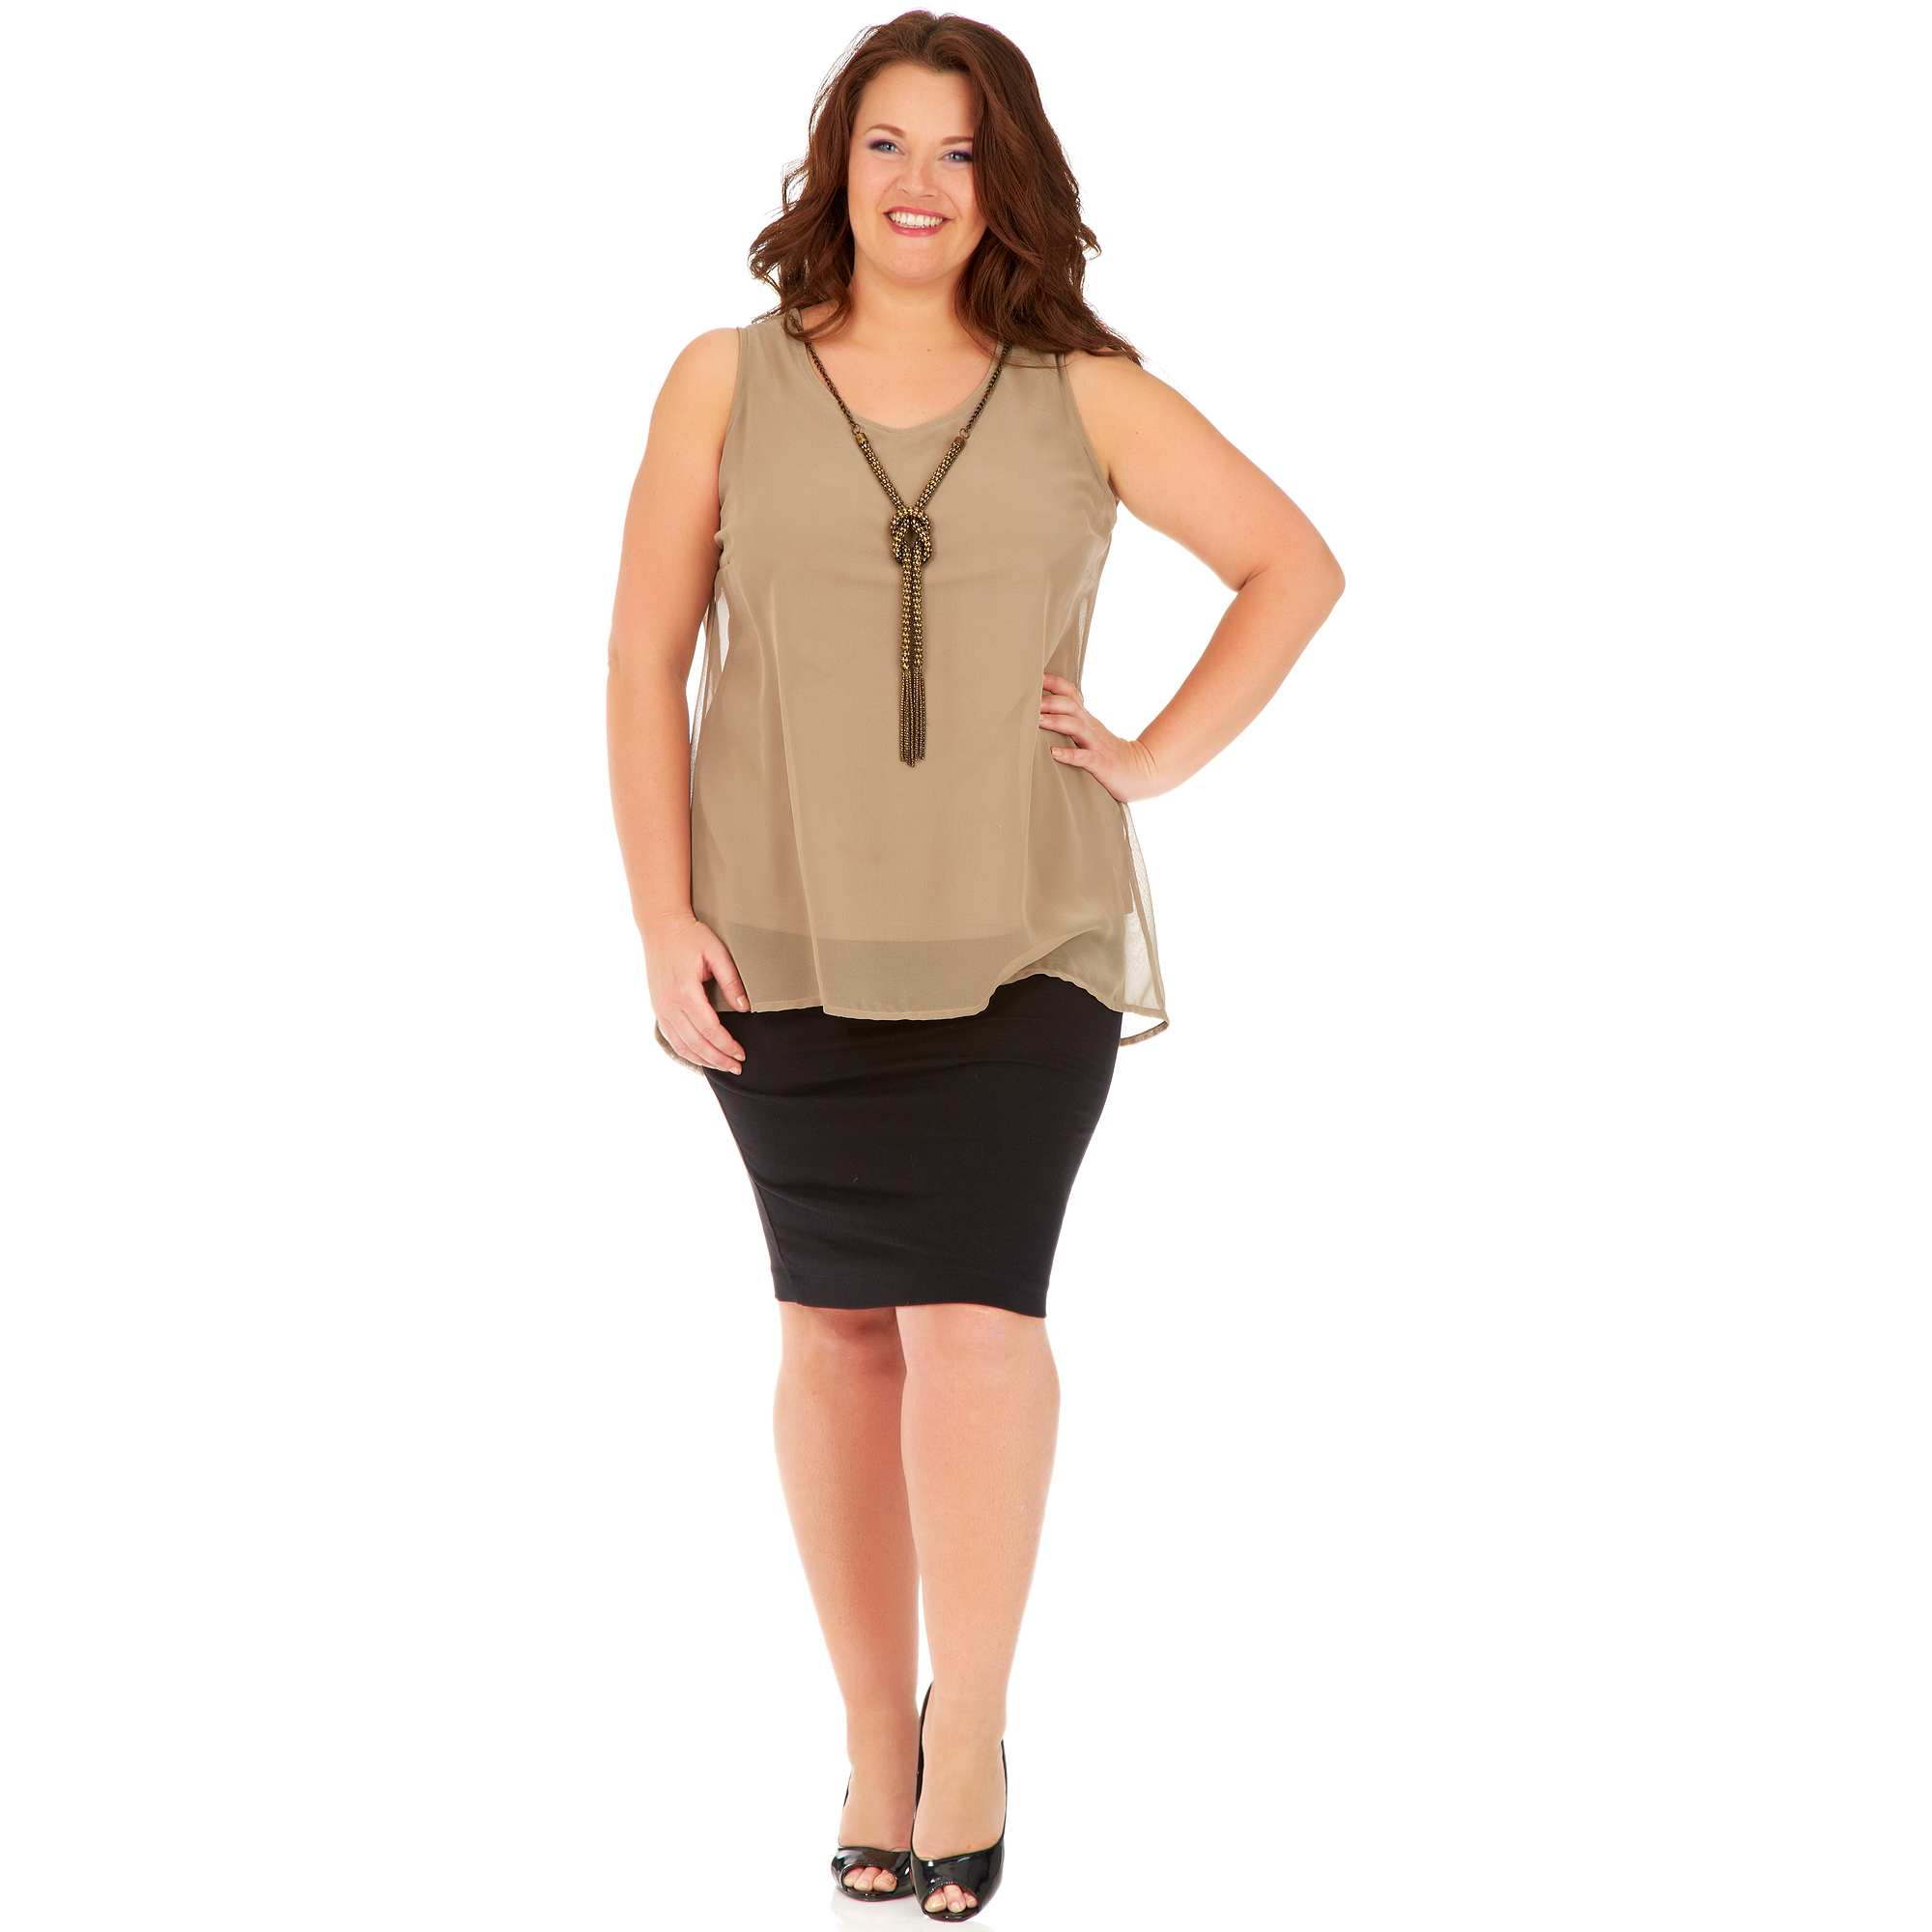 Vetement mode femme 15c6f050520